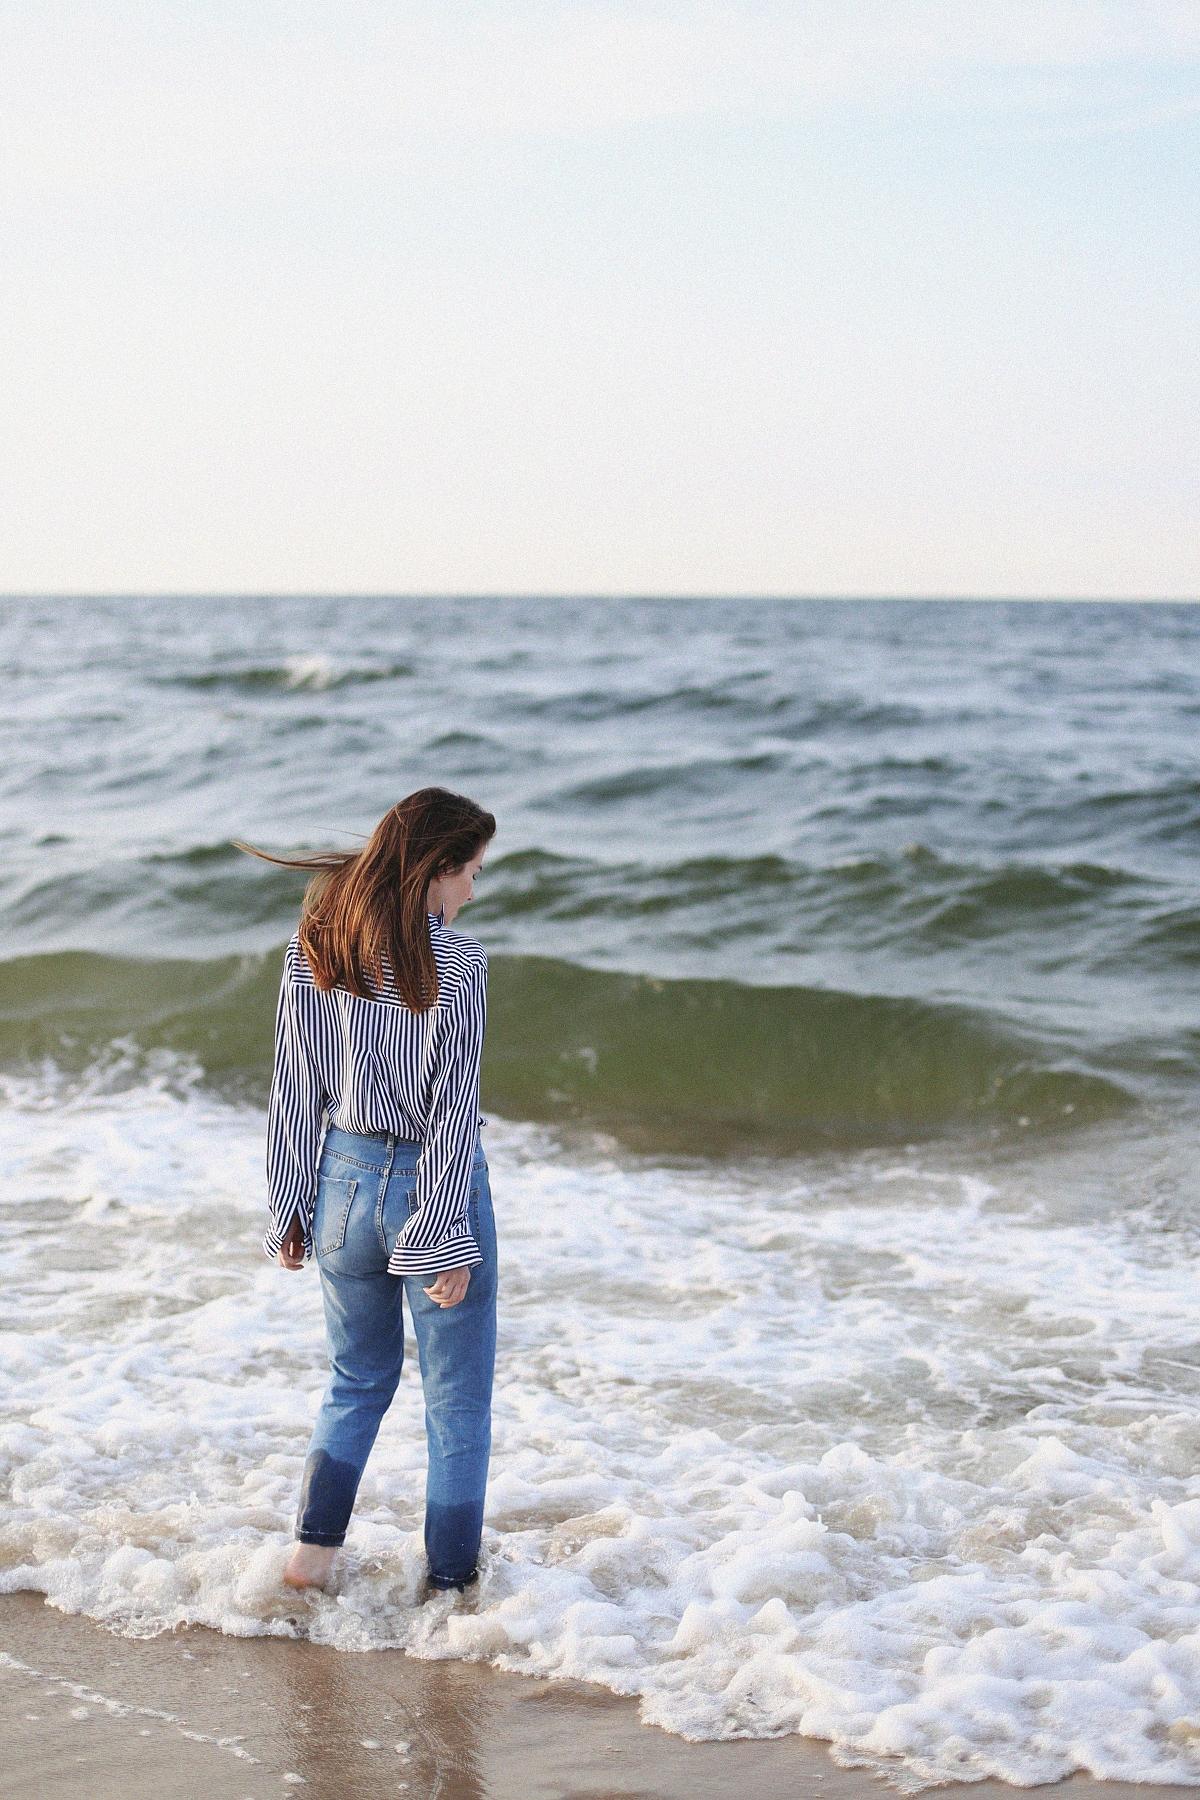 Koszula w paski i mom jeans